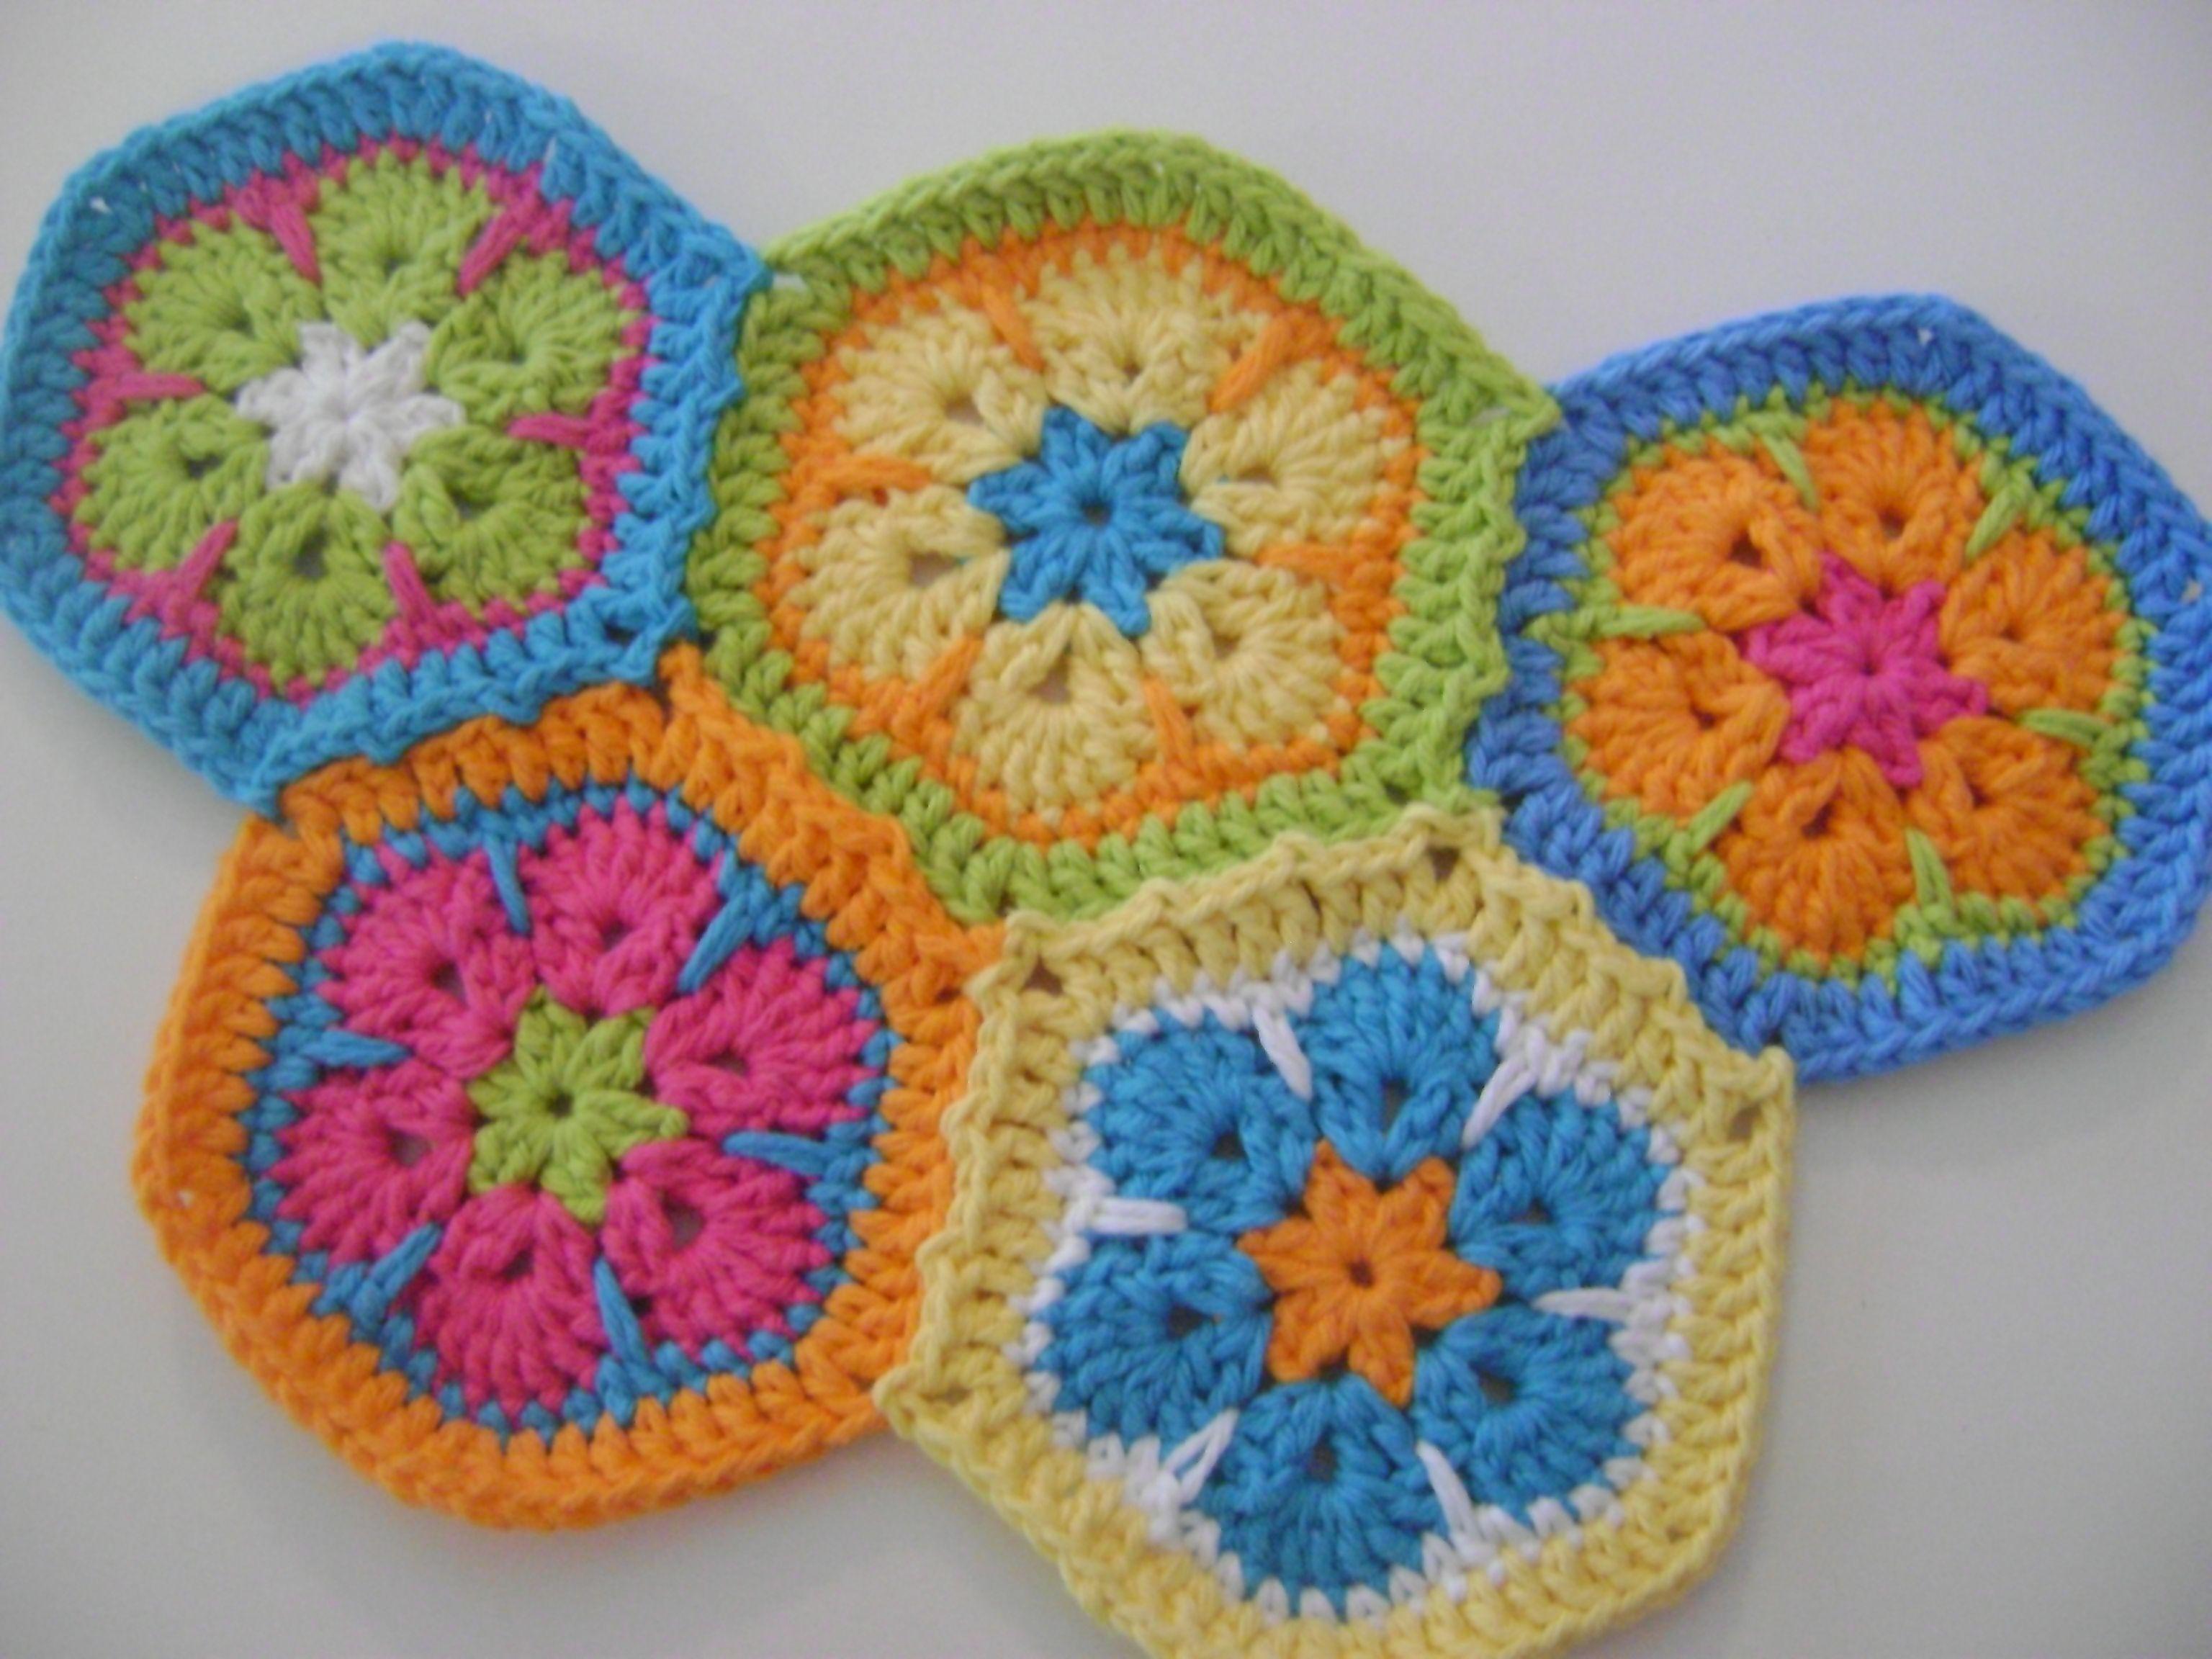 Hexagons On Point in 10 Free Patterns | Pinterest | Hexagon crochet ...